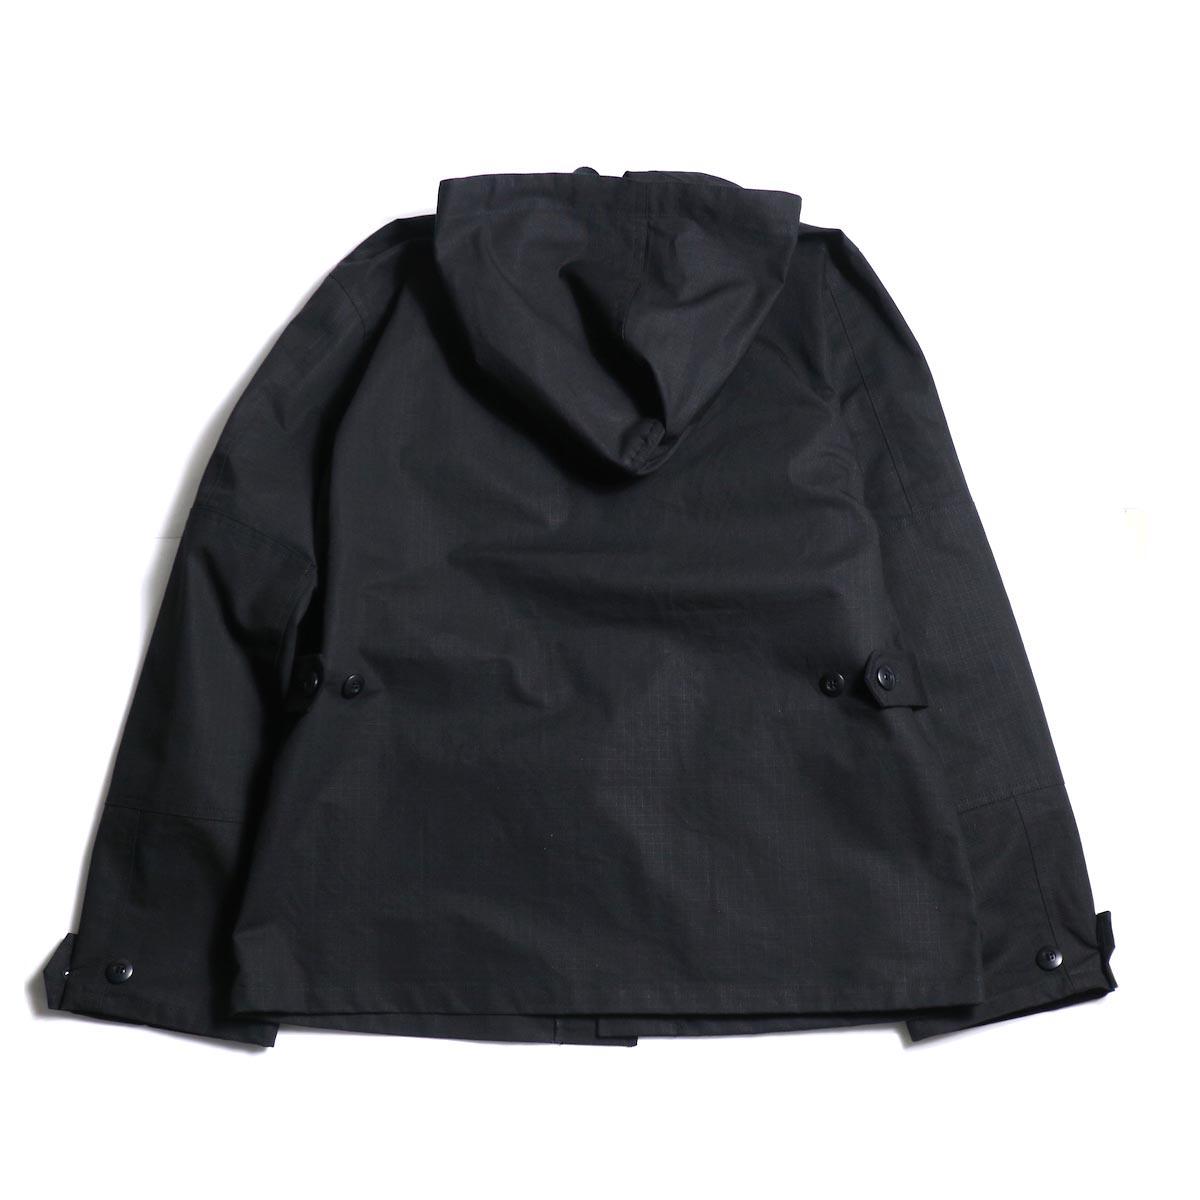 FUTURE PRIMITIVE / FP BDU HOODIE JKT (Black)背面